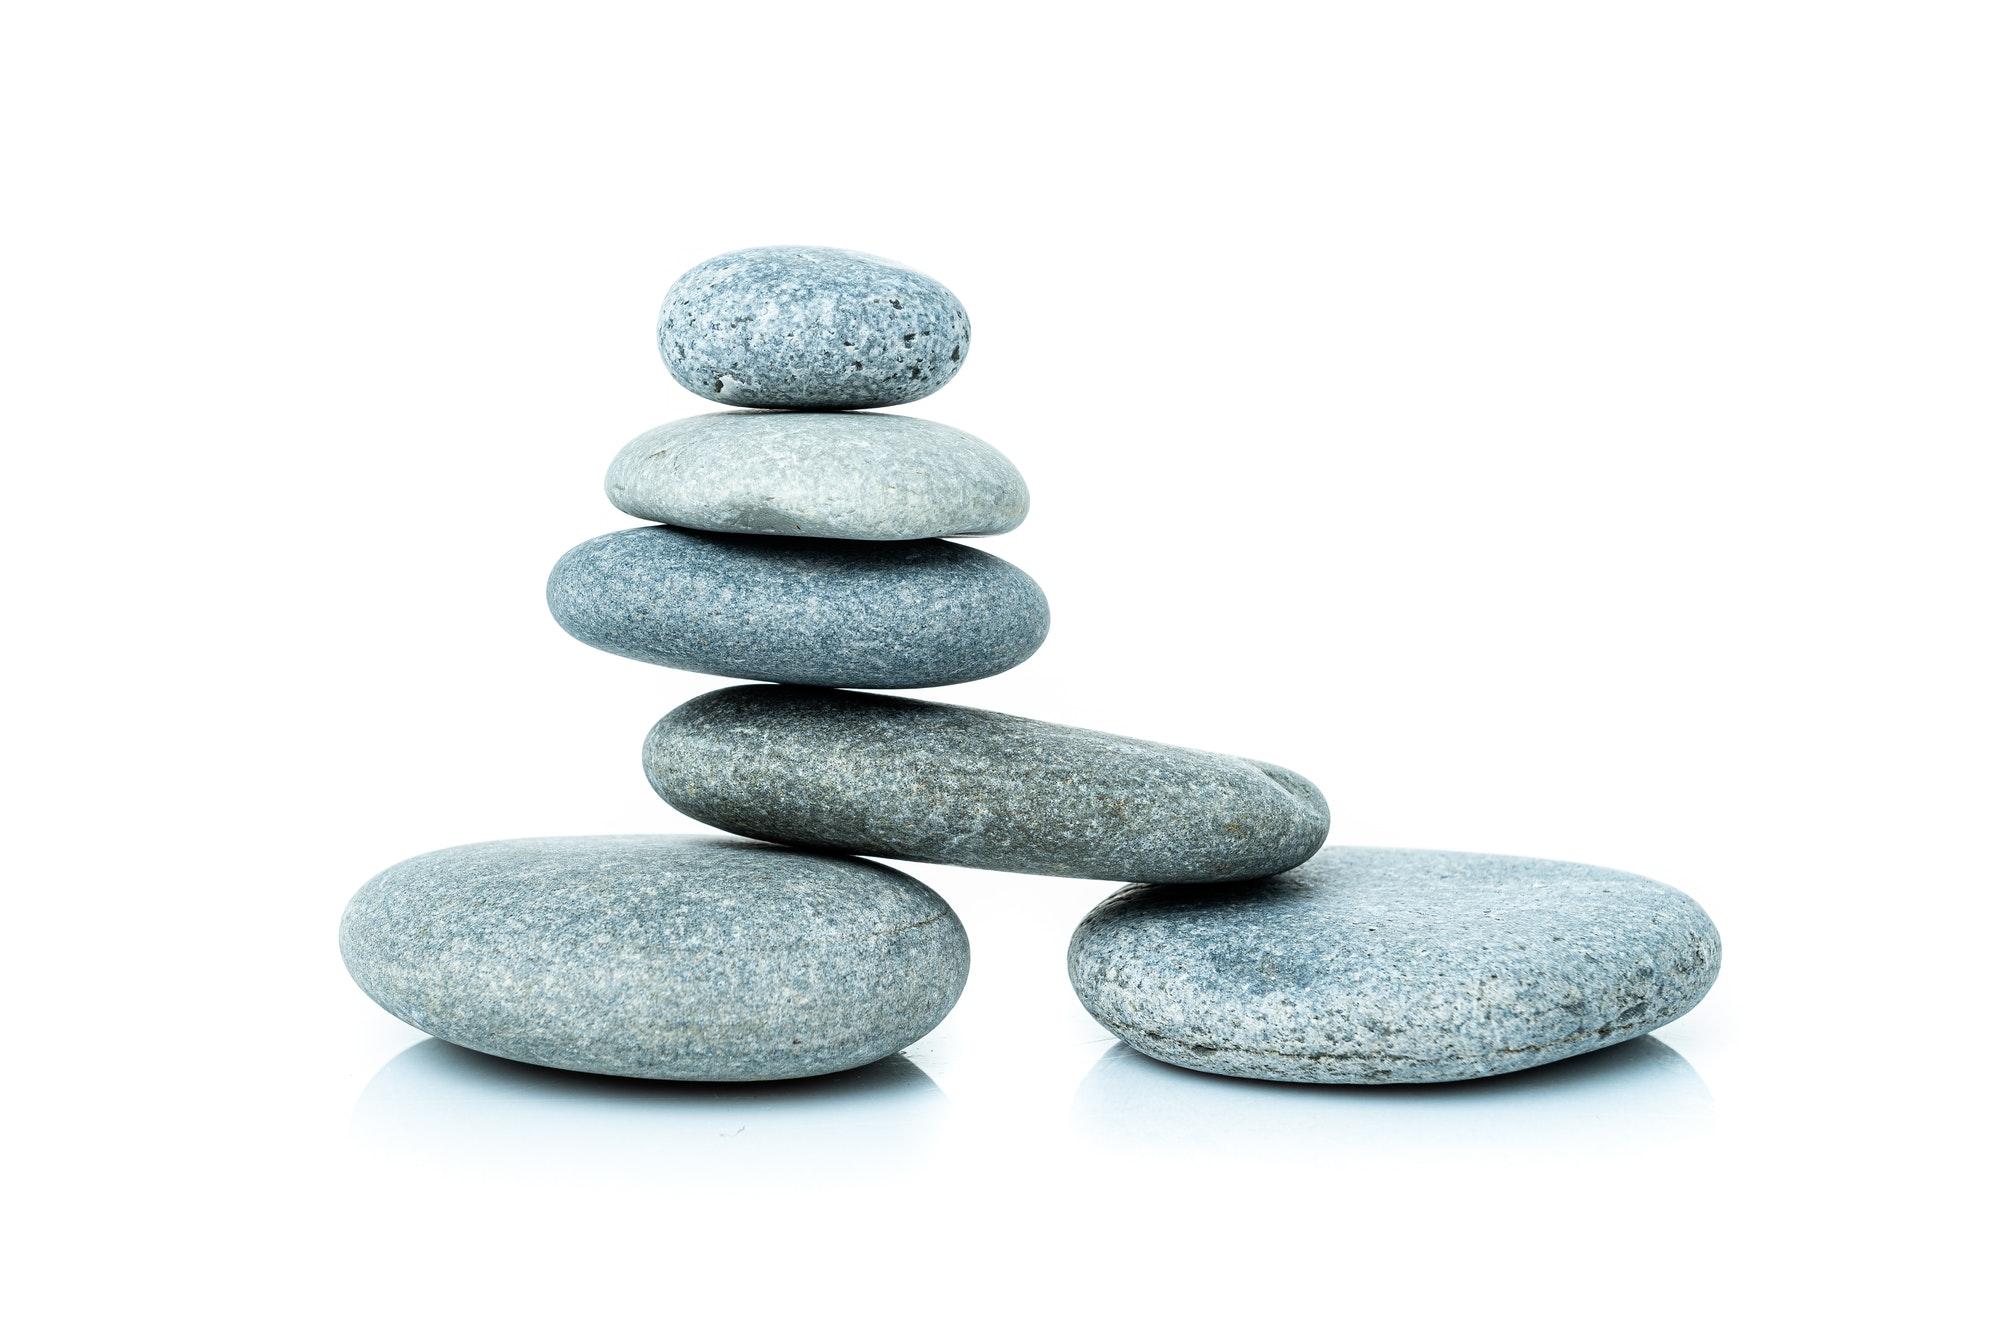 Stacked harmony stones in zen balance. pile of stones isolated on white background